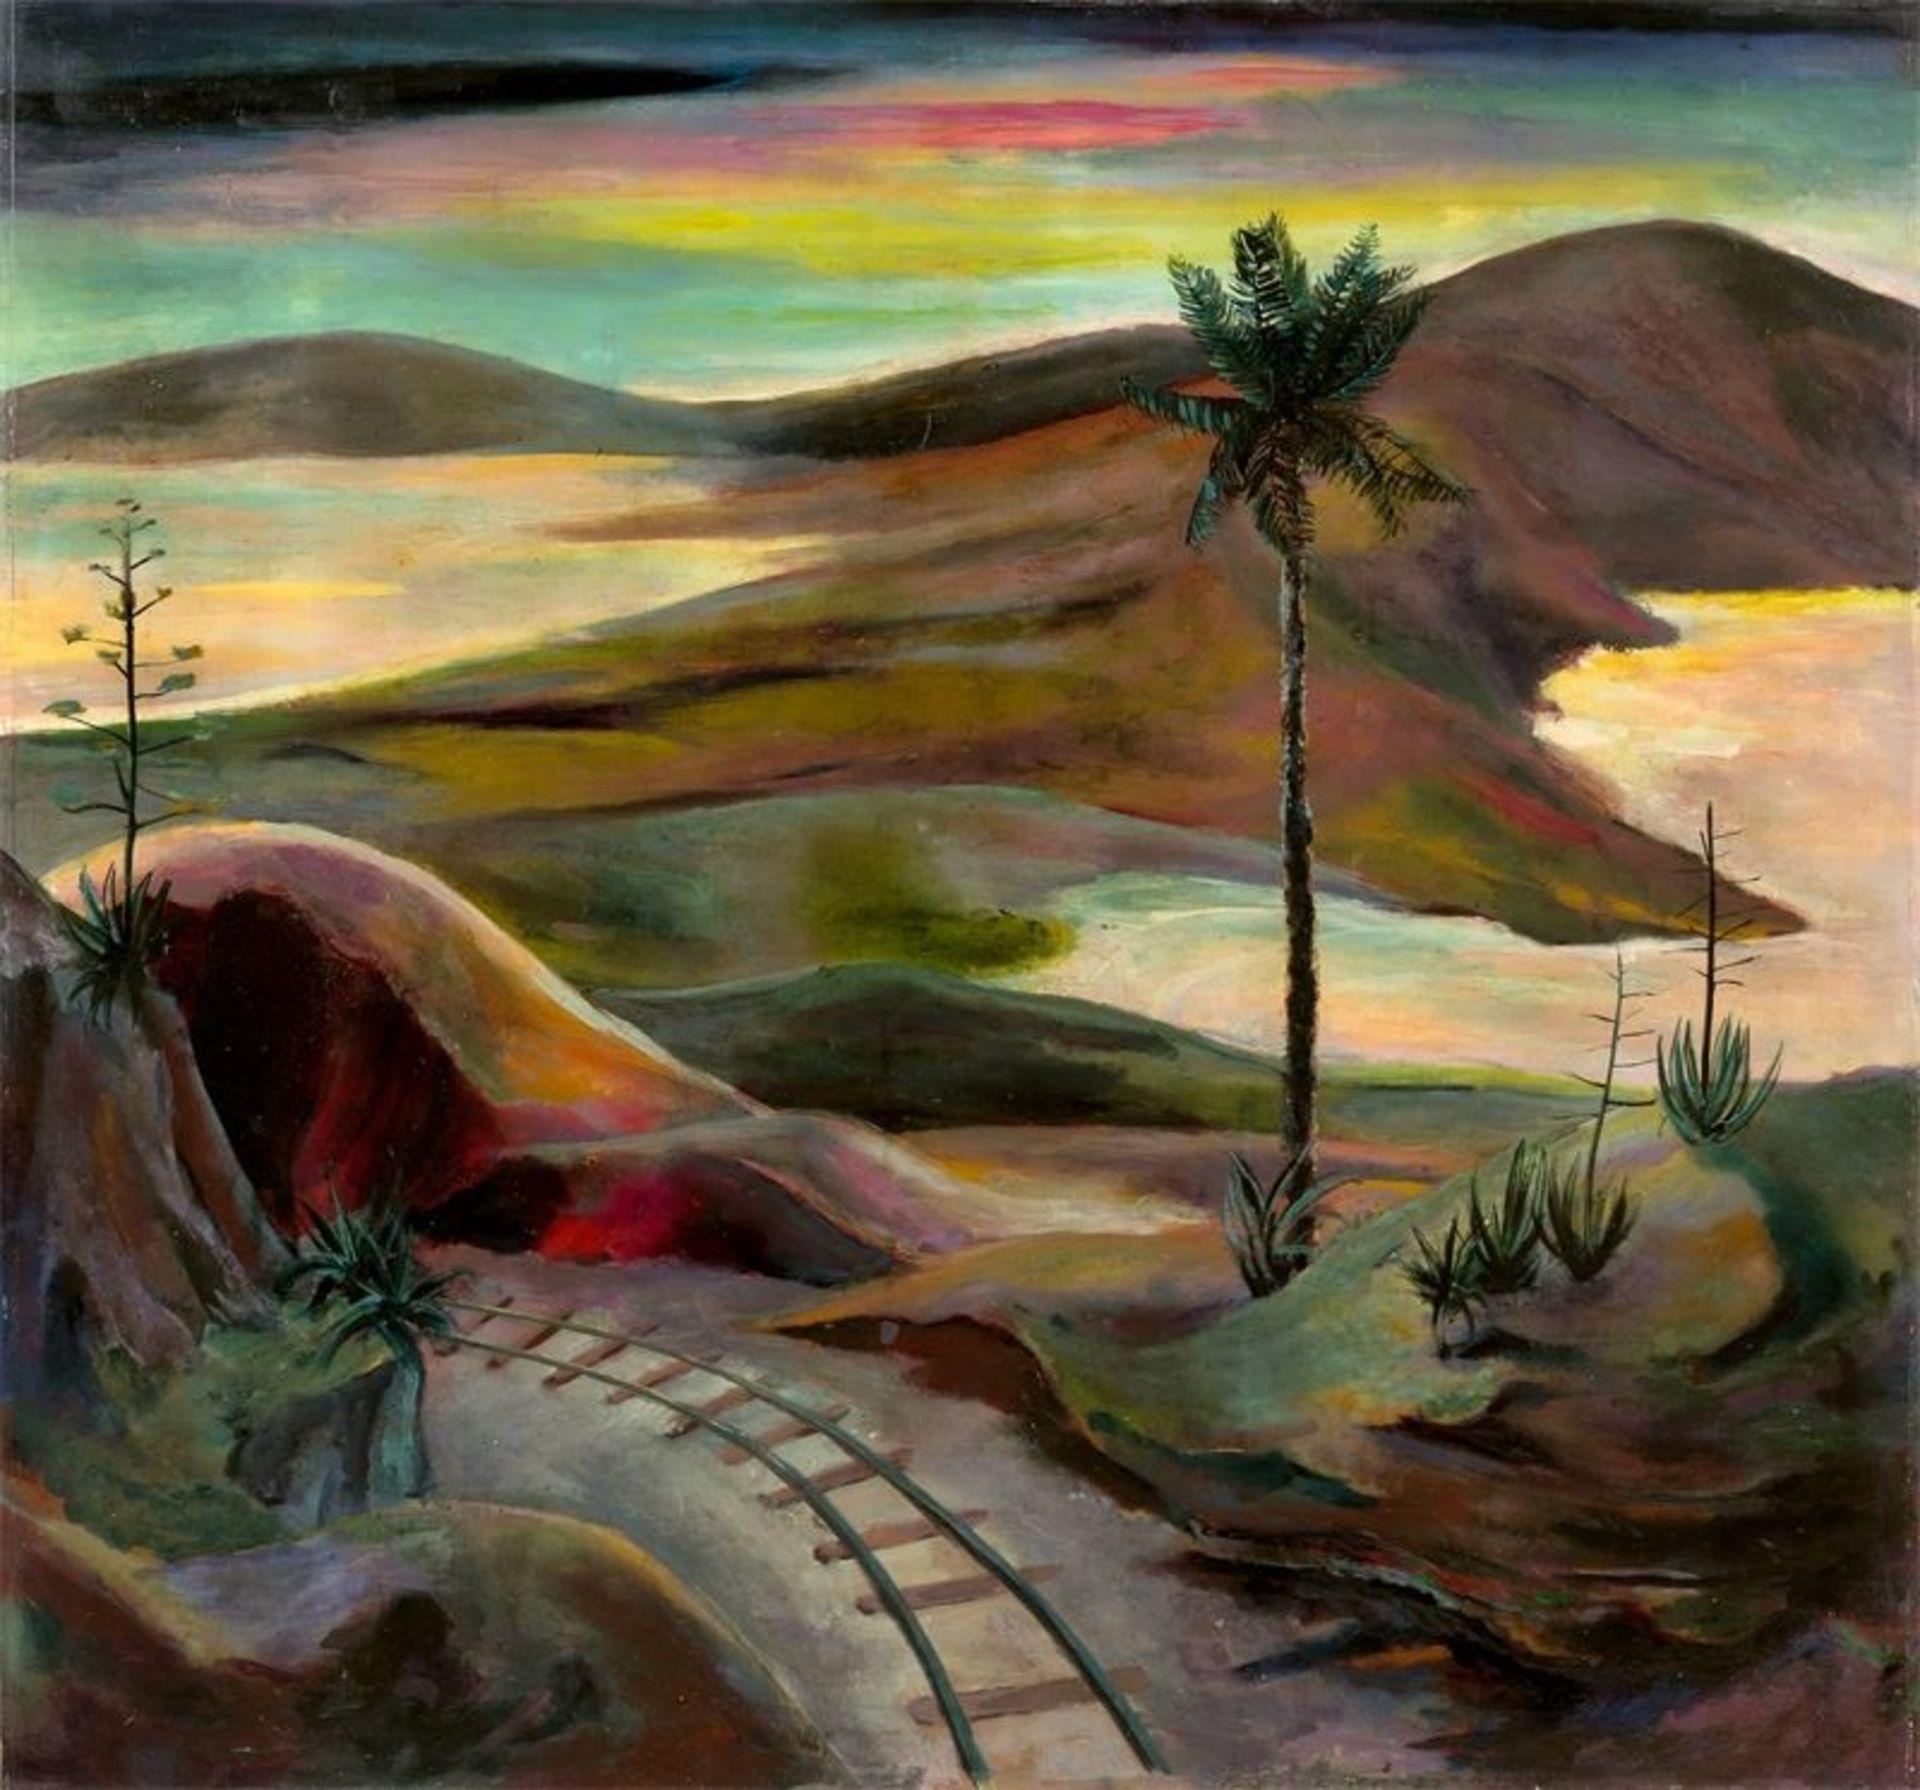 Los 206 - Hanns Ludwig Katz (Karlsruhe 1892 – 1940 Johannesburg)